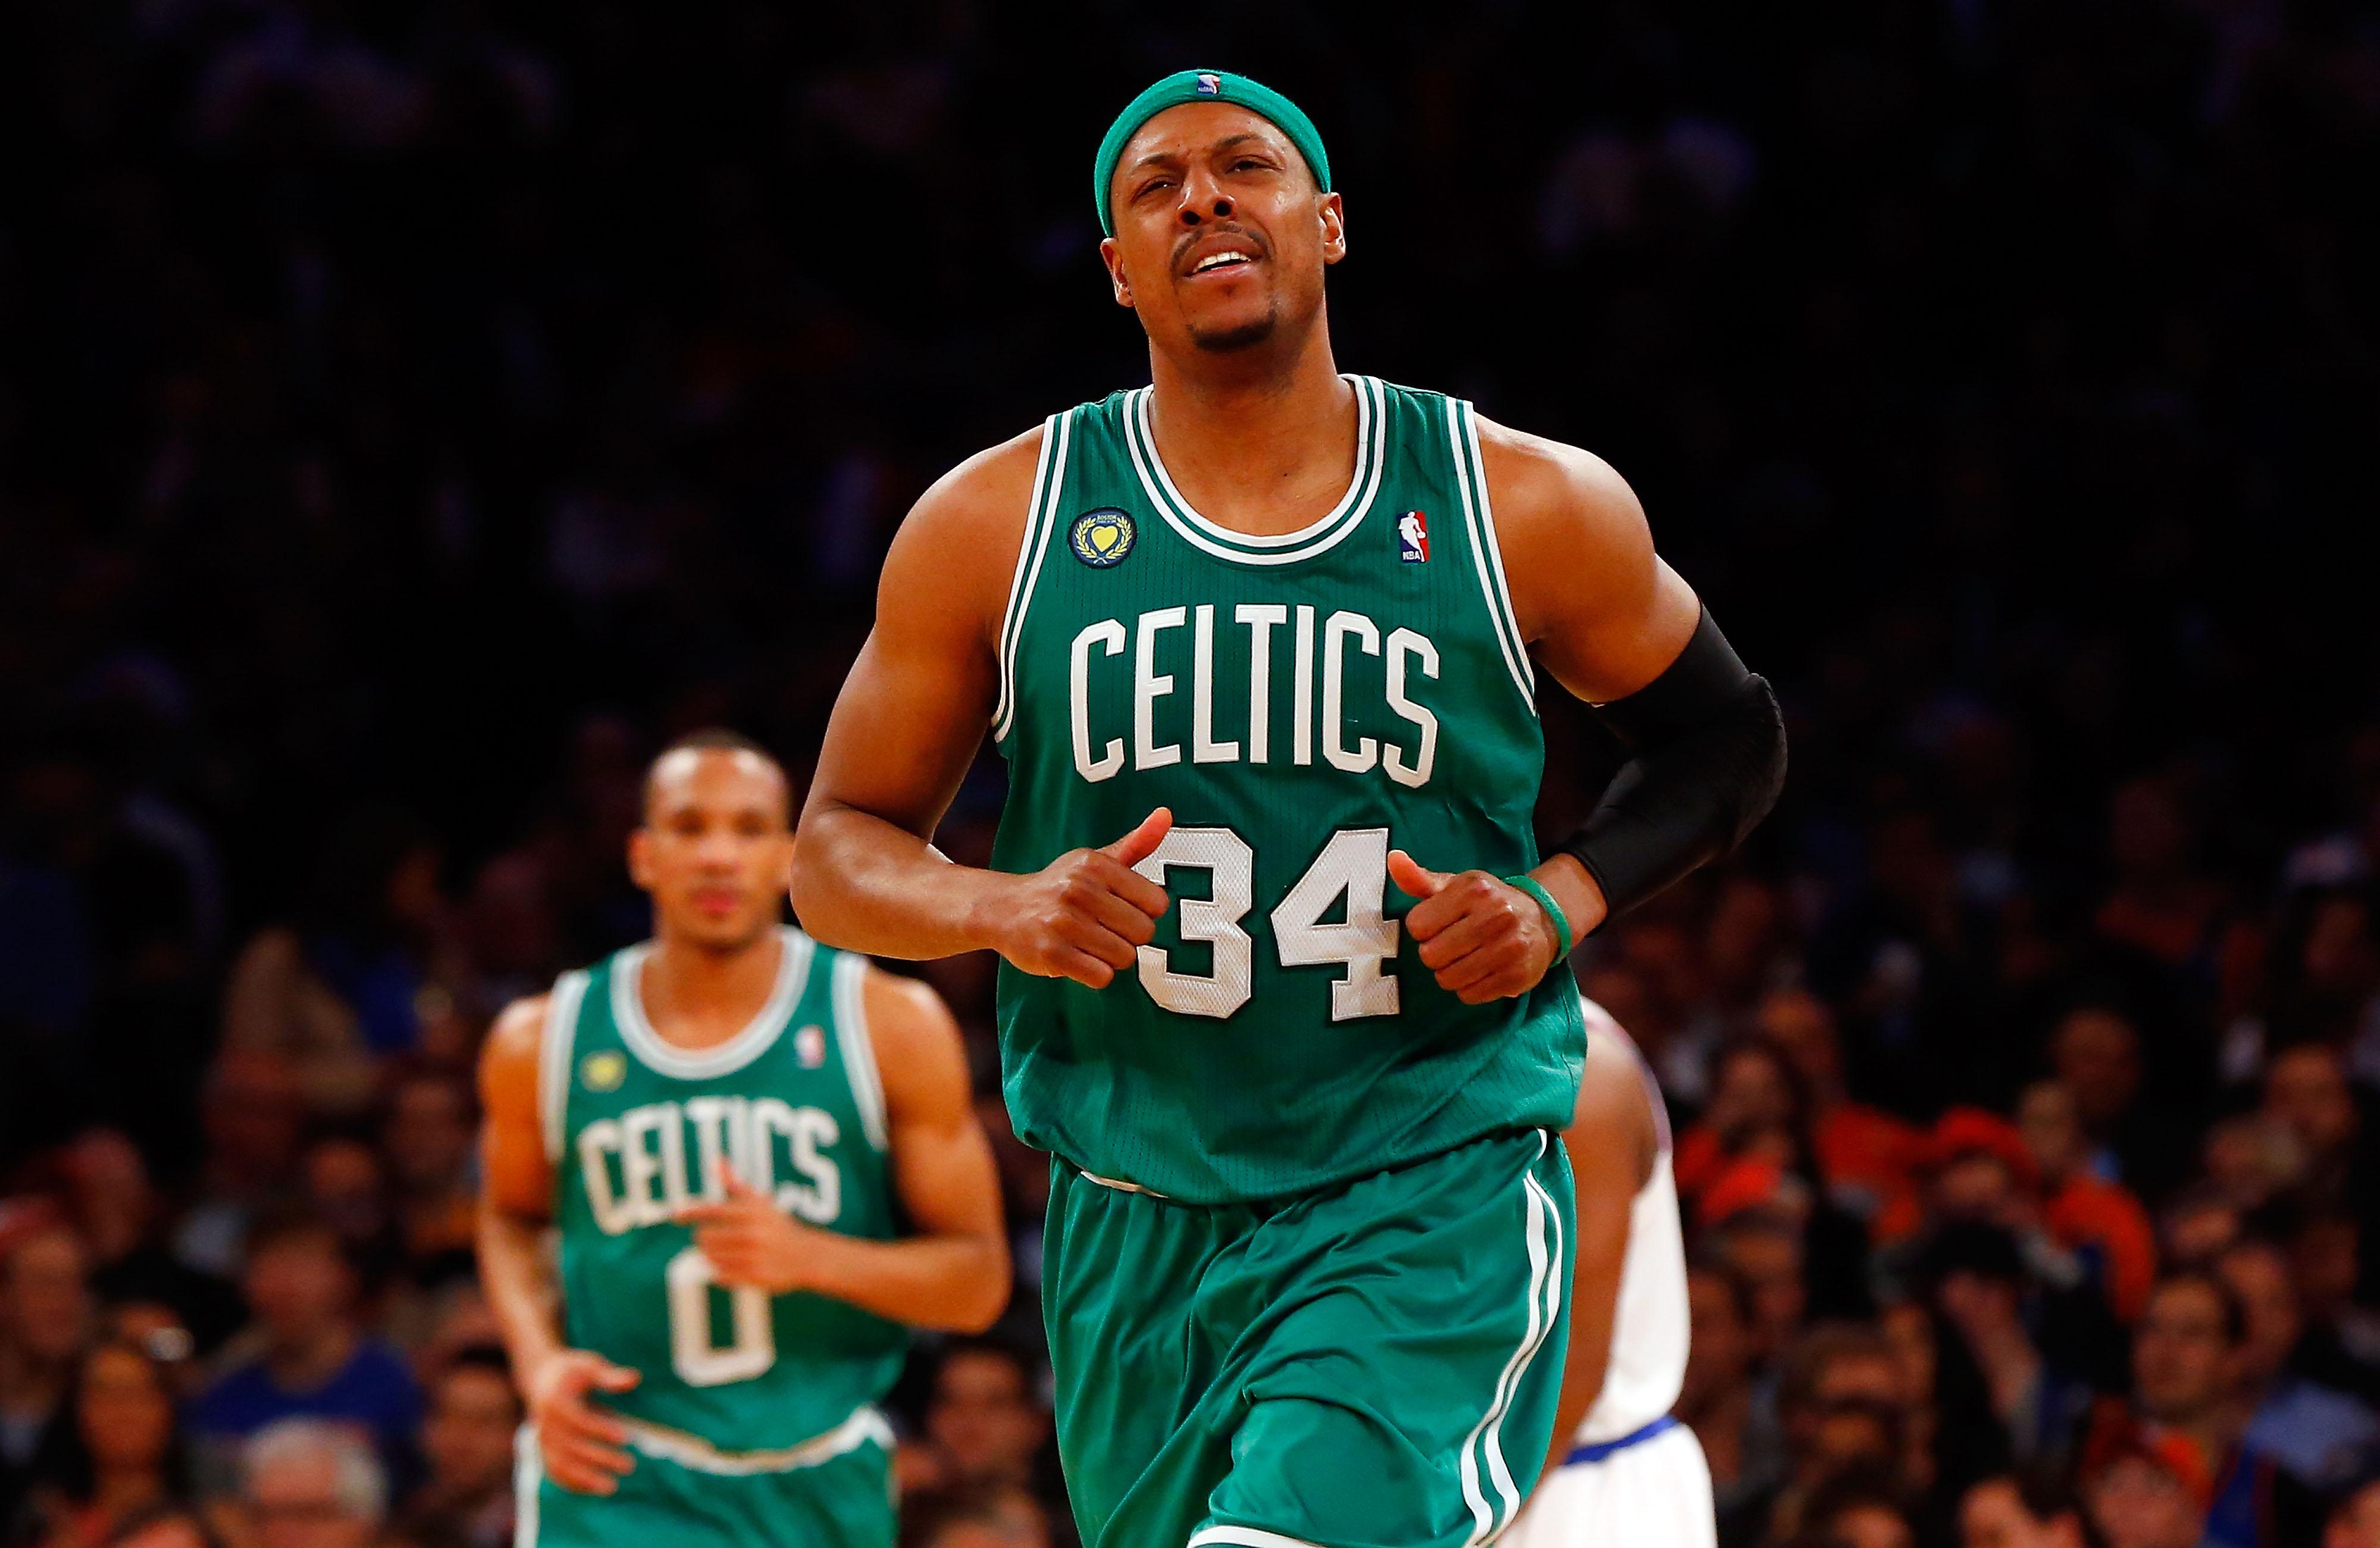 Nba Finals Game 5 Fox Sports | Basketball Scores